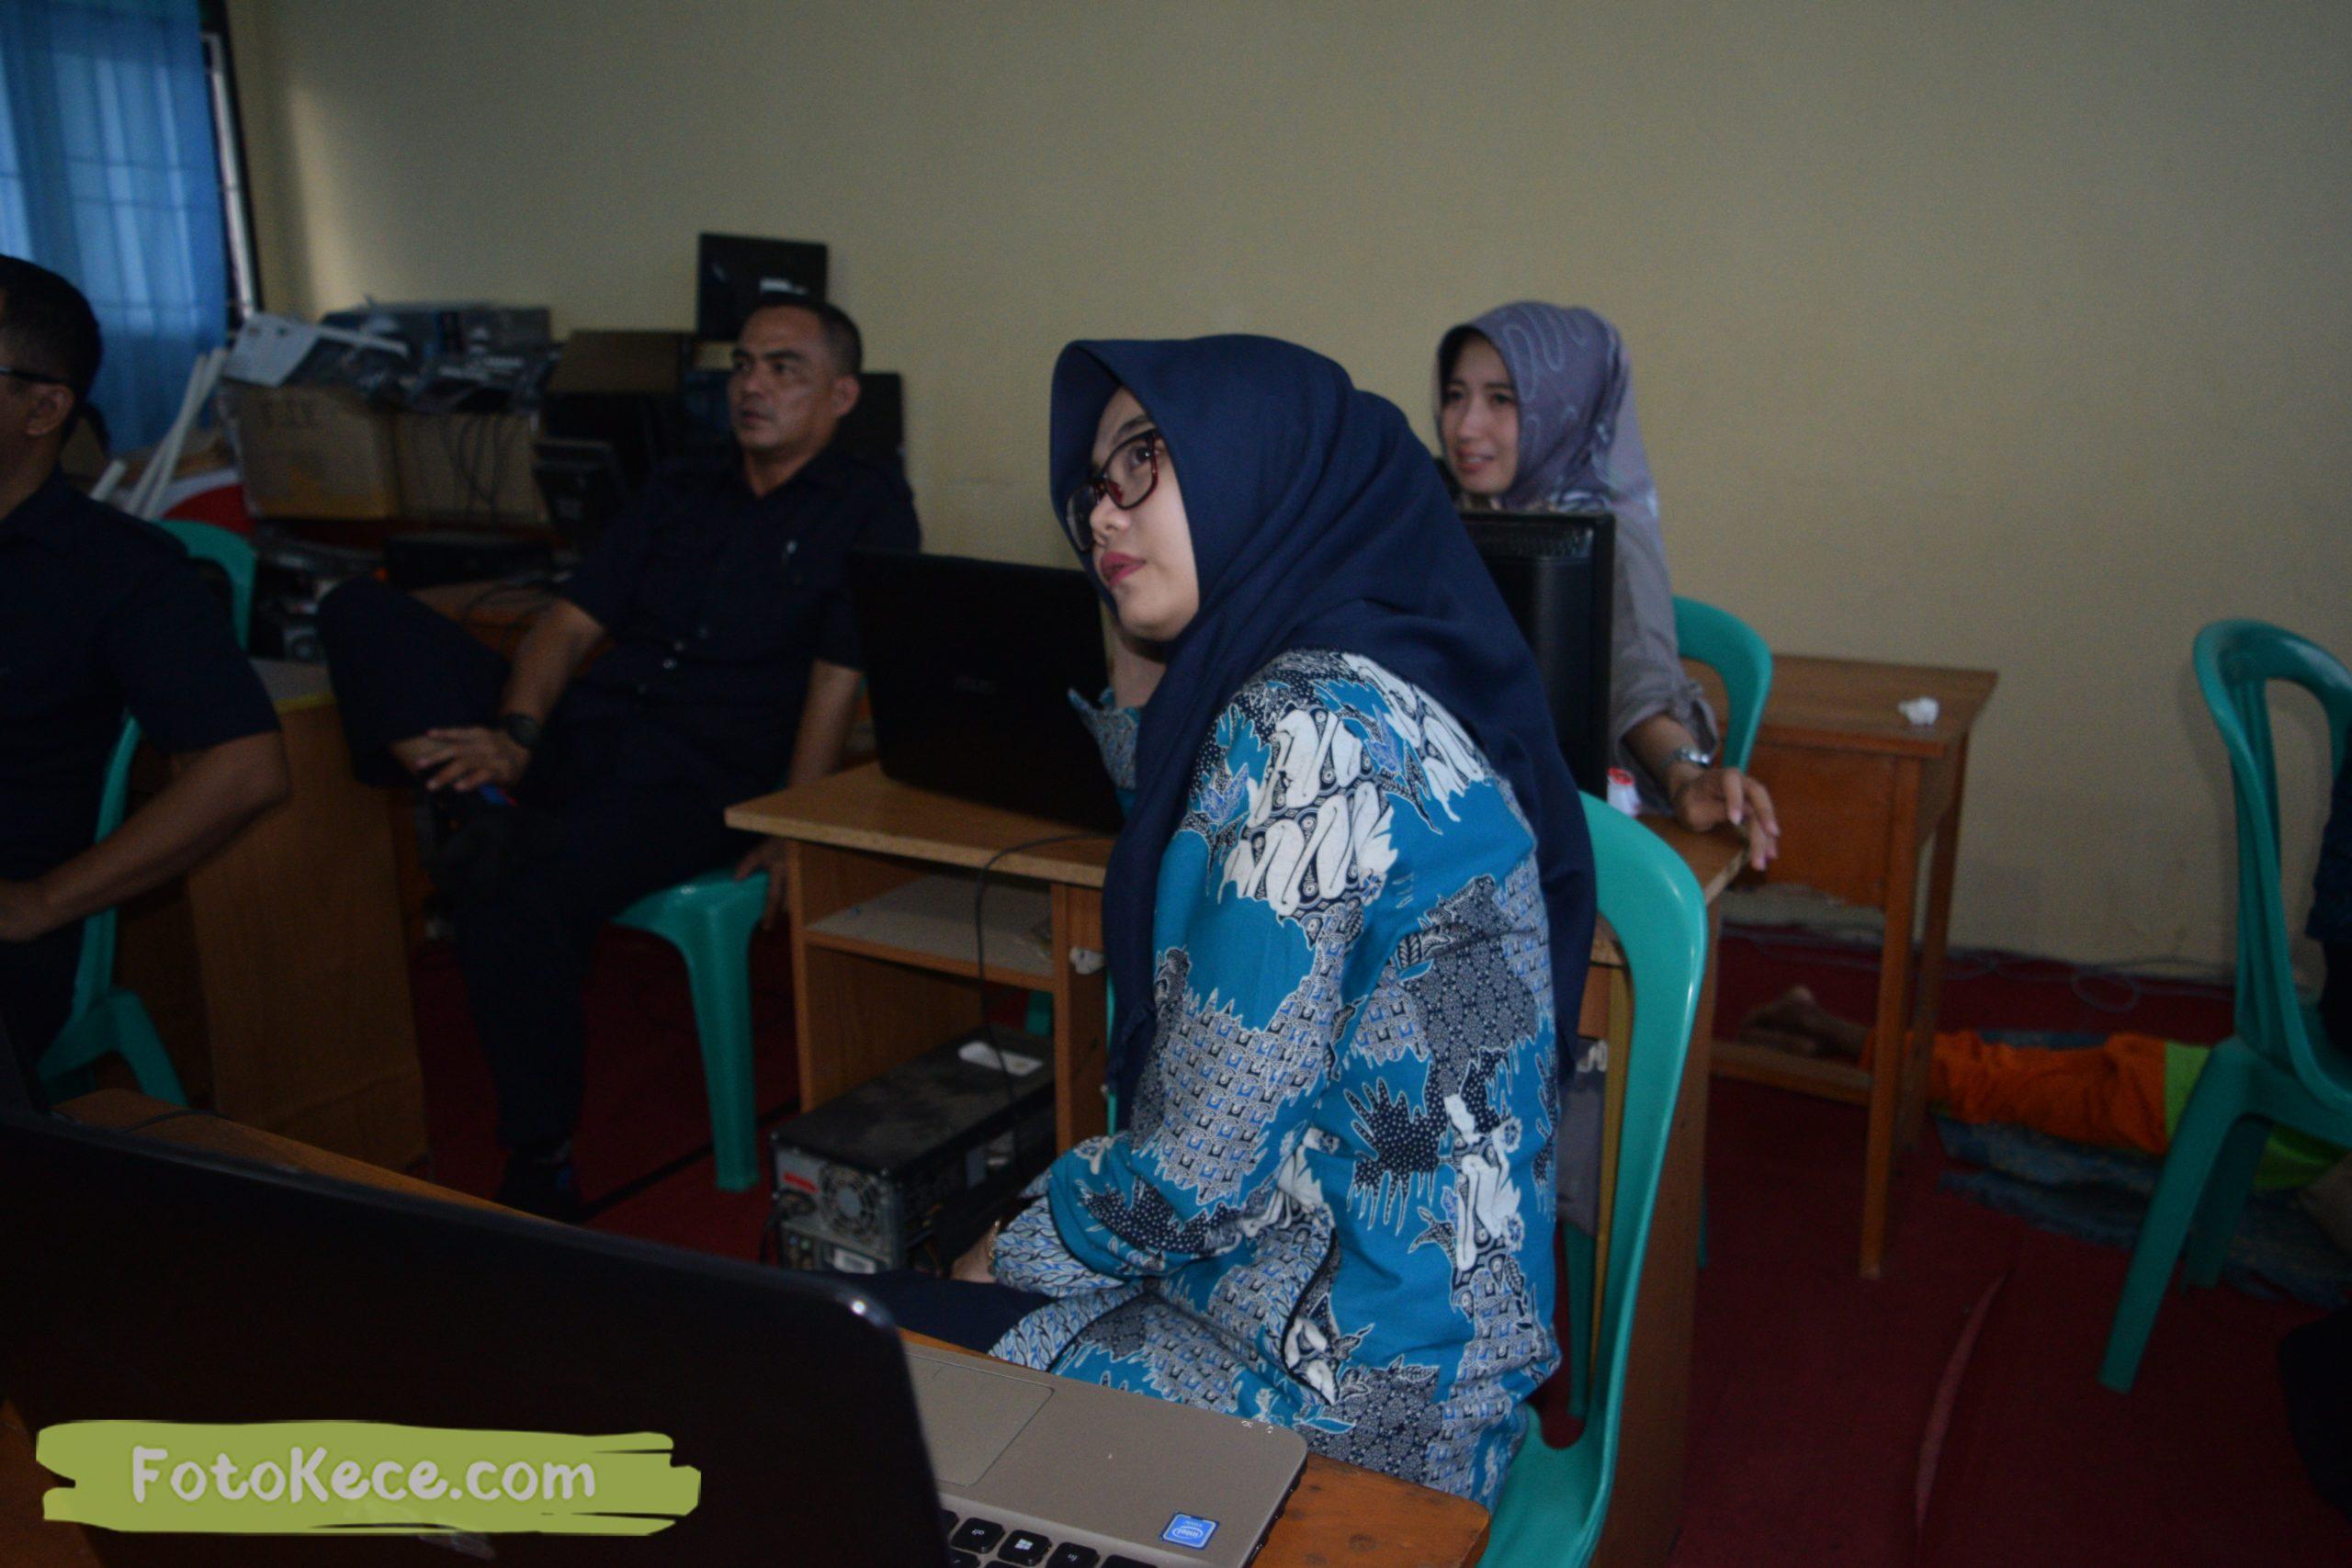 bimbingan teknis sieka 2020 bersama Bpk Abdul Aziz 08012020 fotokece 41 scaled